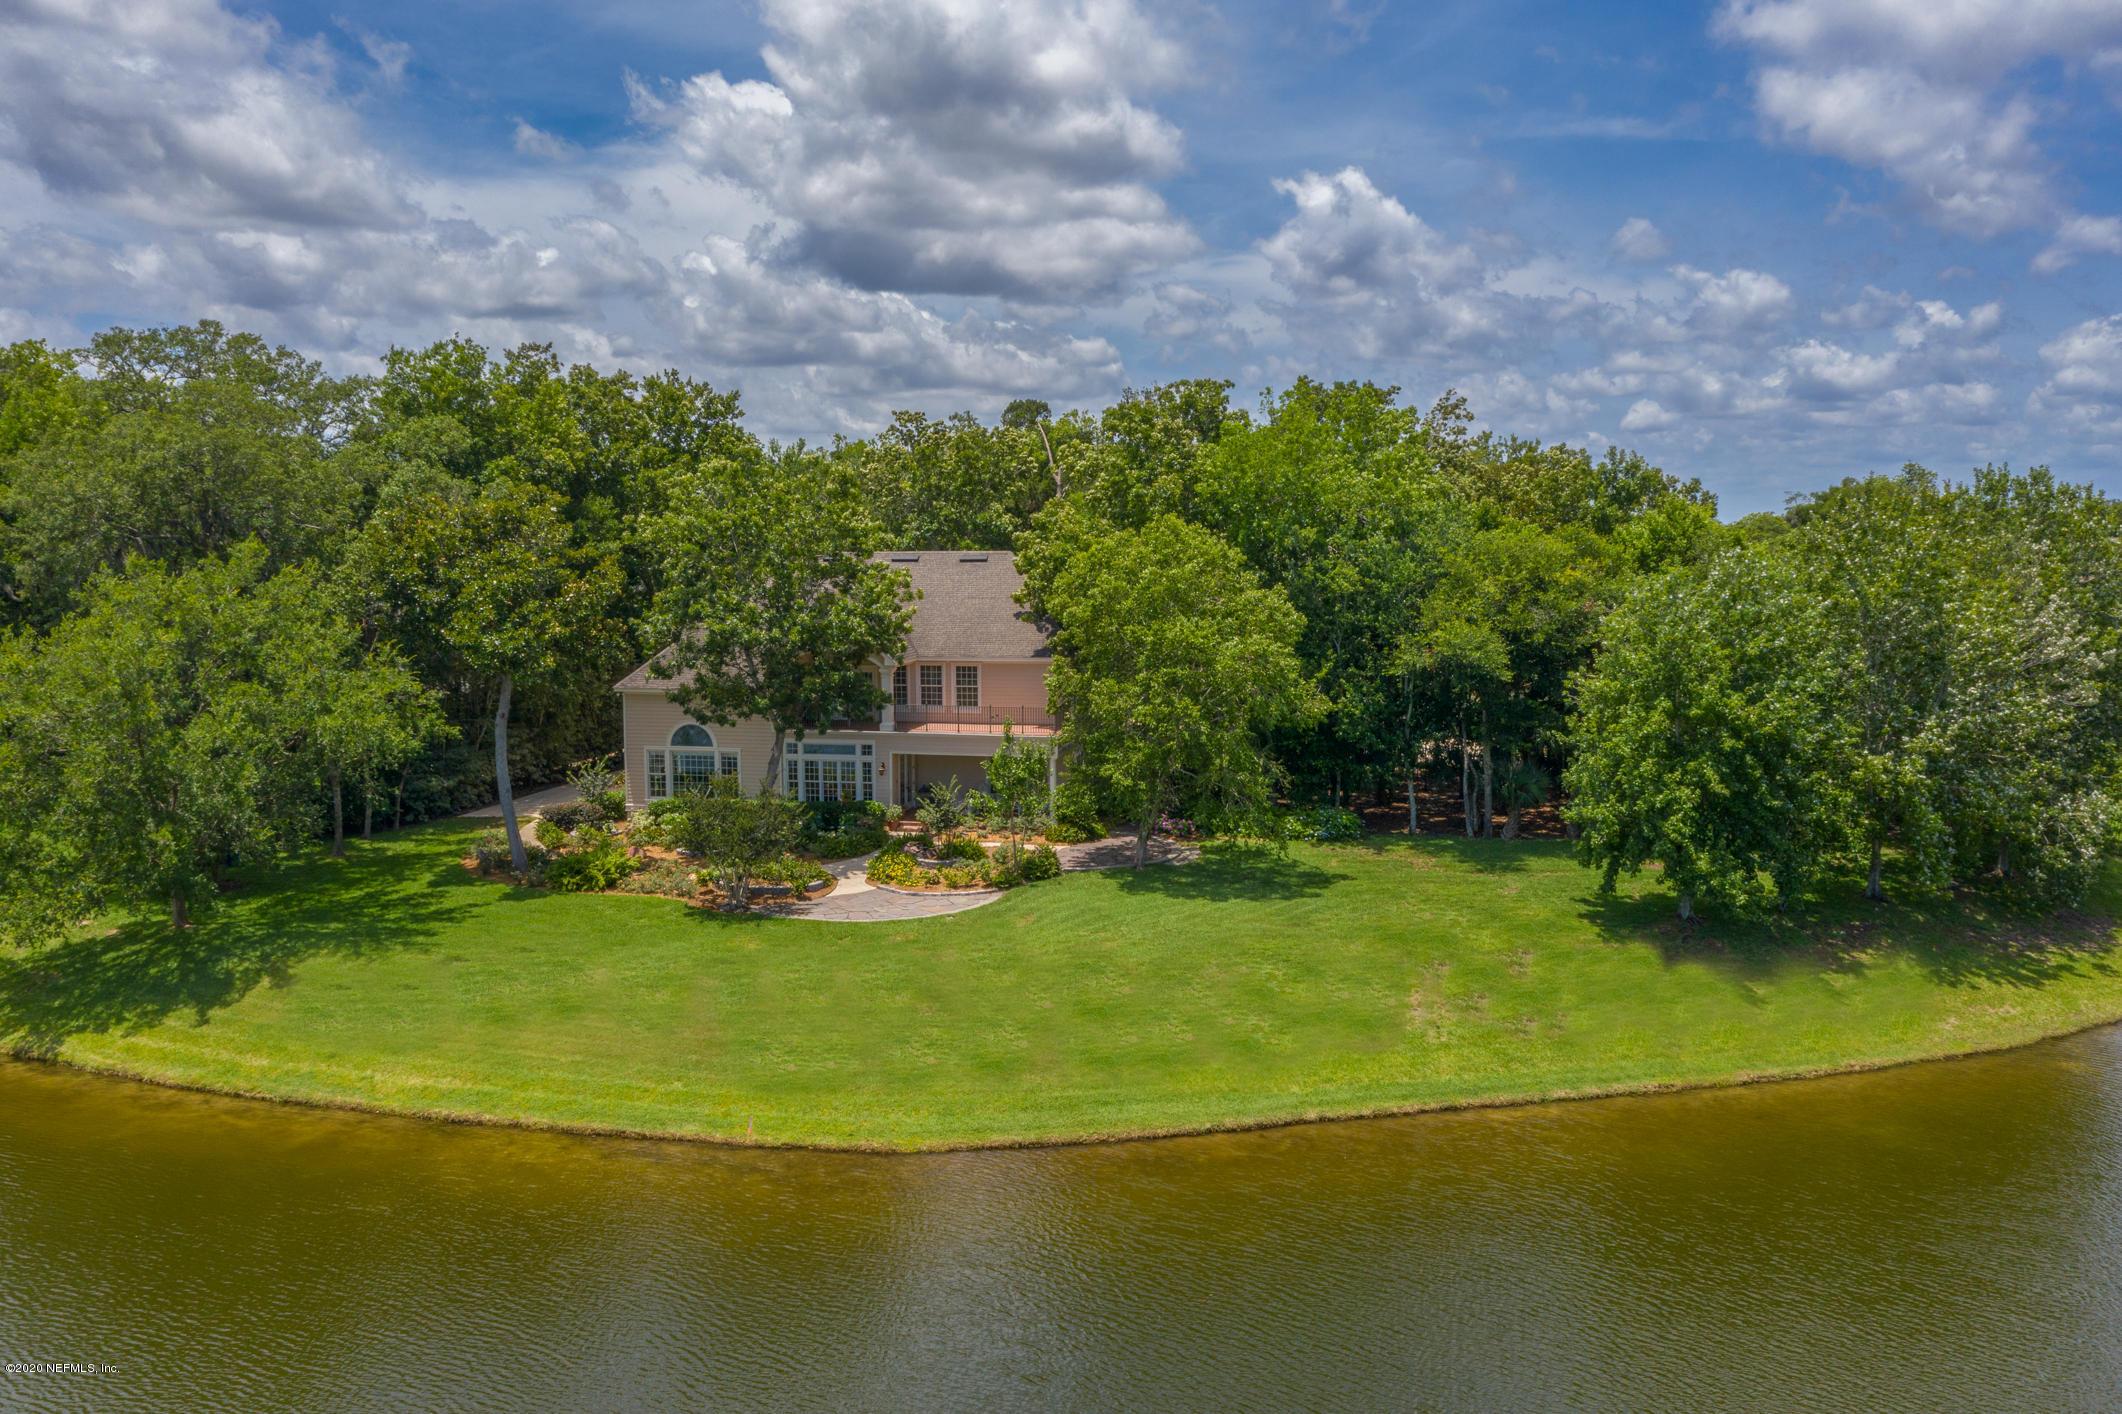 1695 NORTON HILL, JACKSONVILLE, FLORIDA 32225, 5 Bedrooms Bedrooms, ,4 BathroomsBathrooms,Residential,For sale,NORTON HILL,1056825